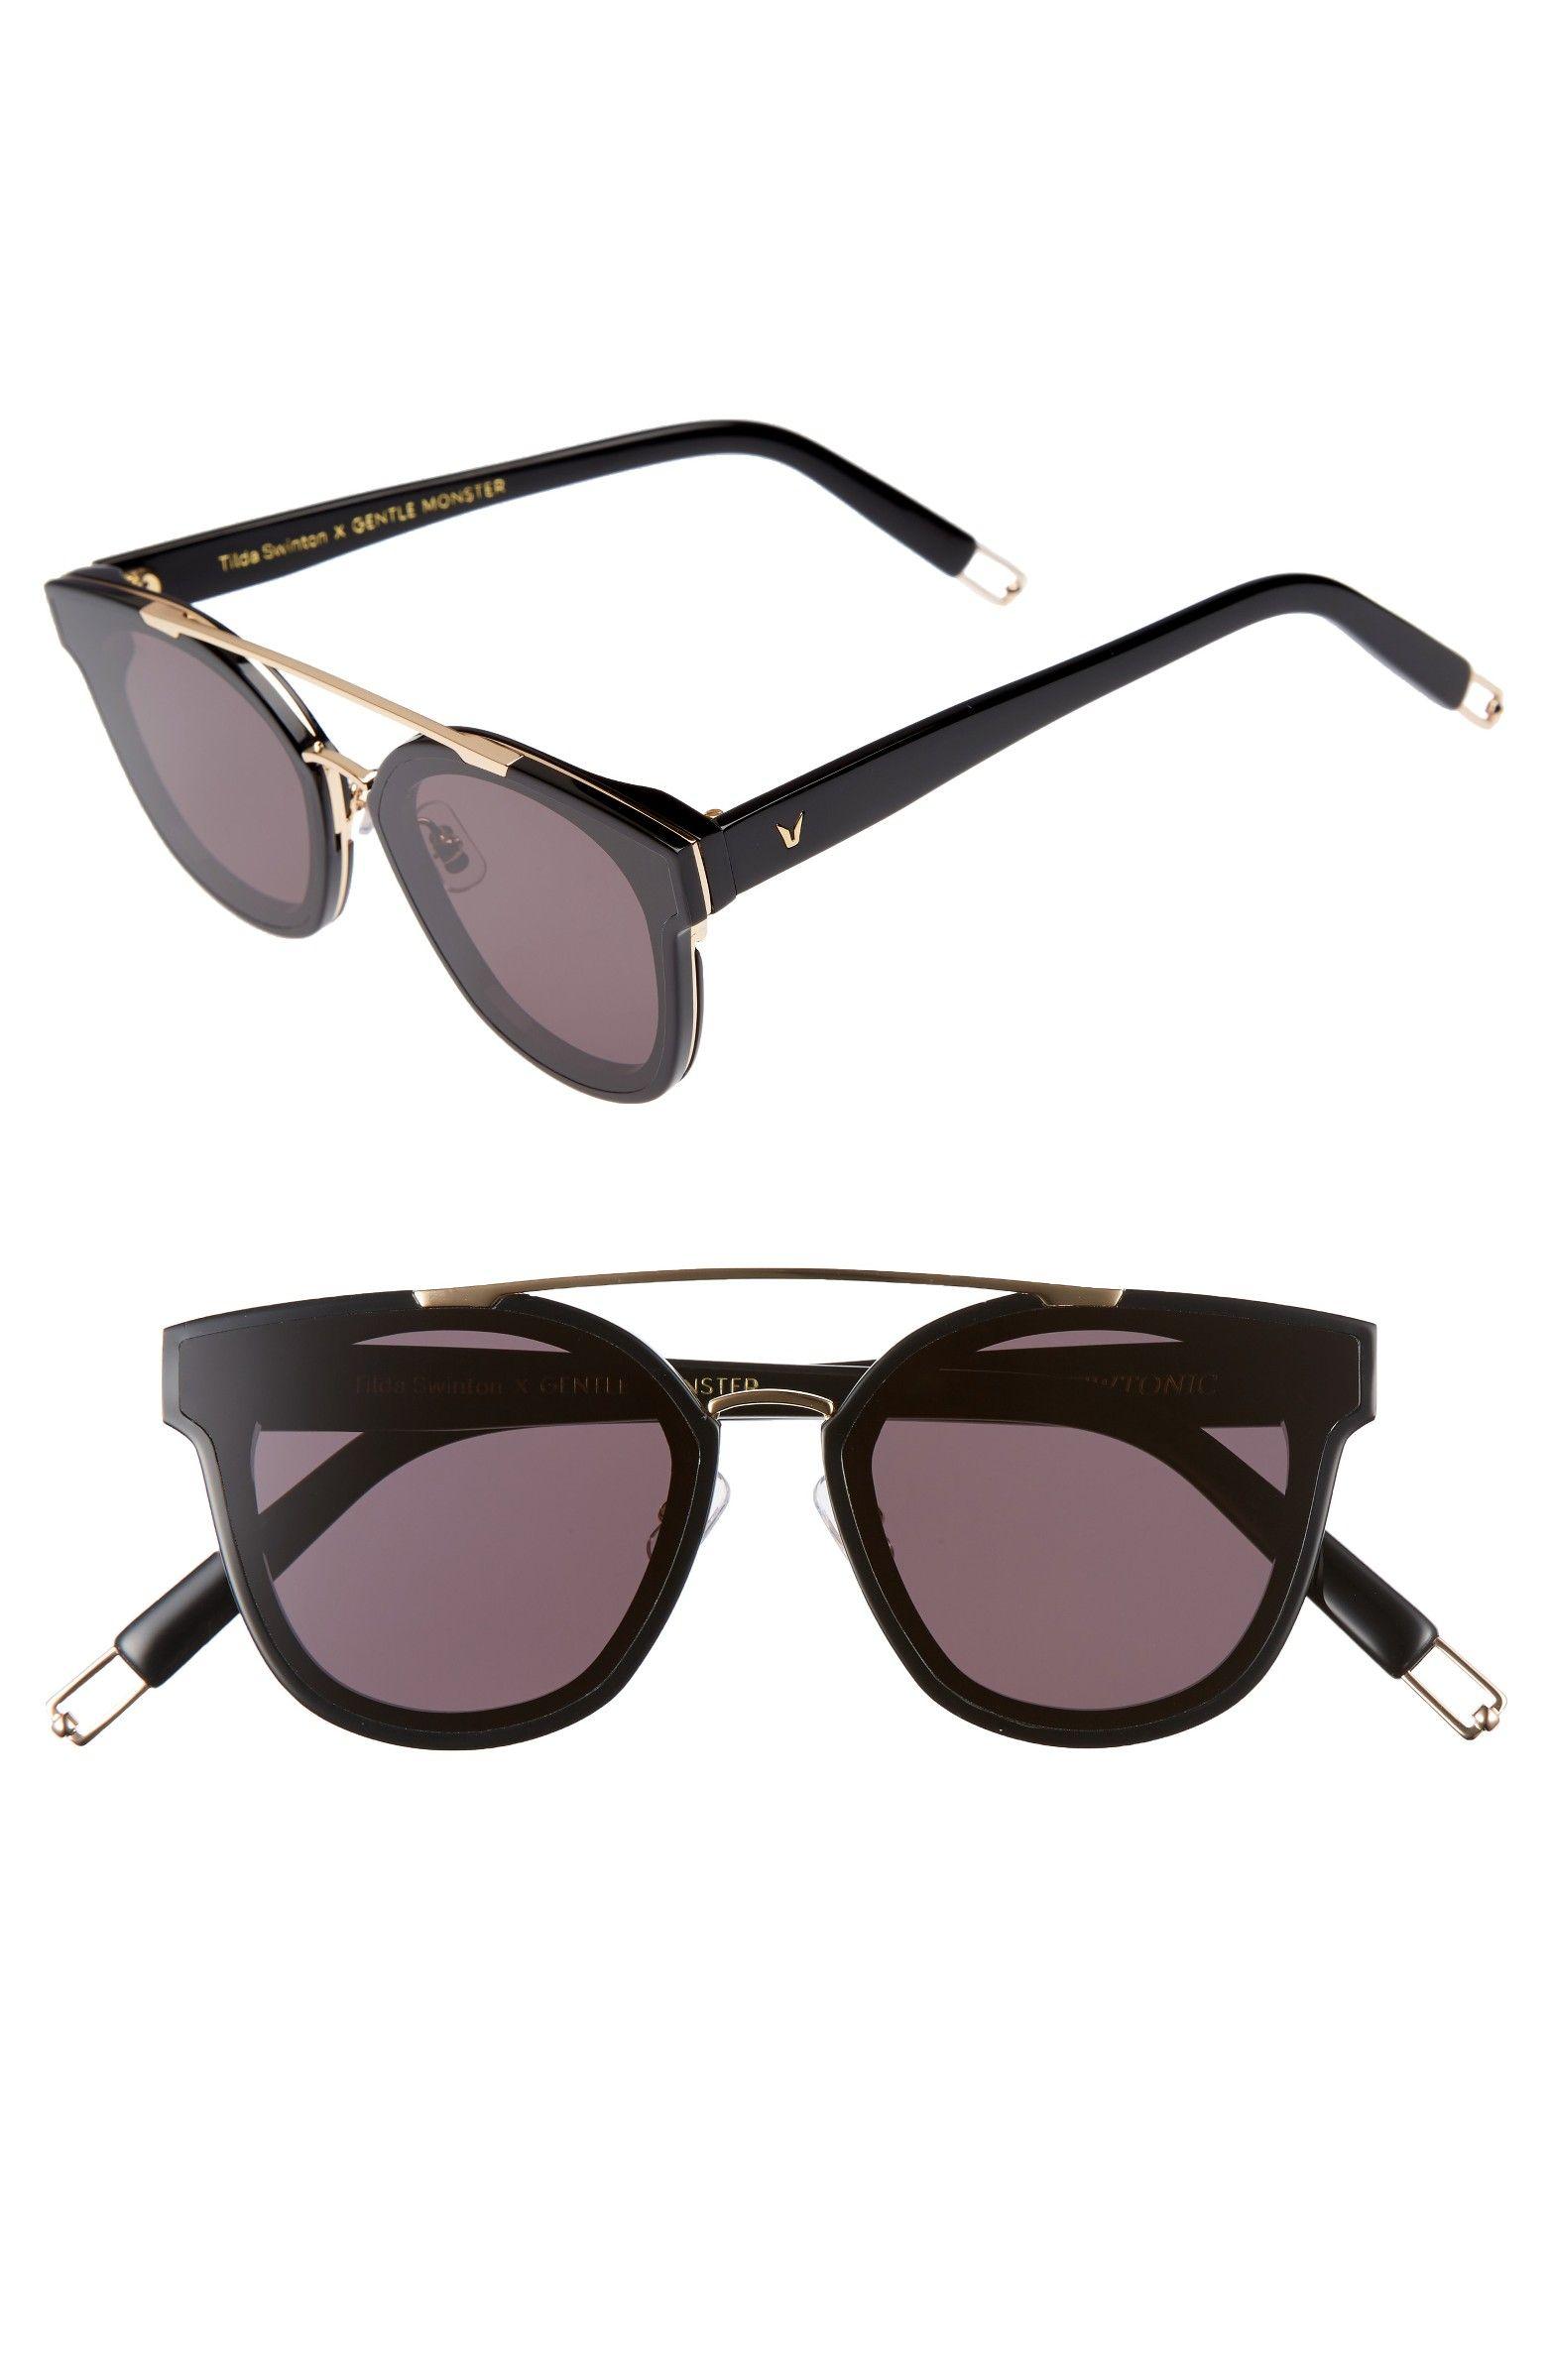 103a93ede9f8 Main Image - Tilda Swinton x Gentle Monster Newtonic 60mm Rounded Sunglasses